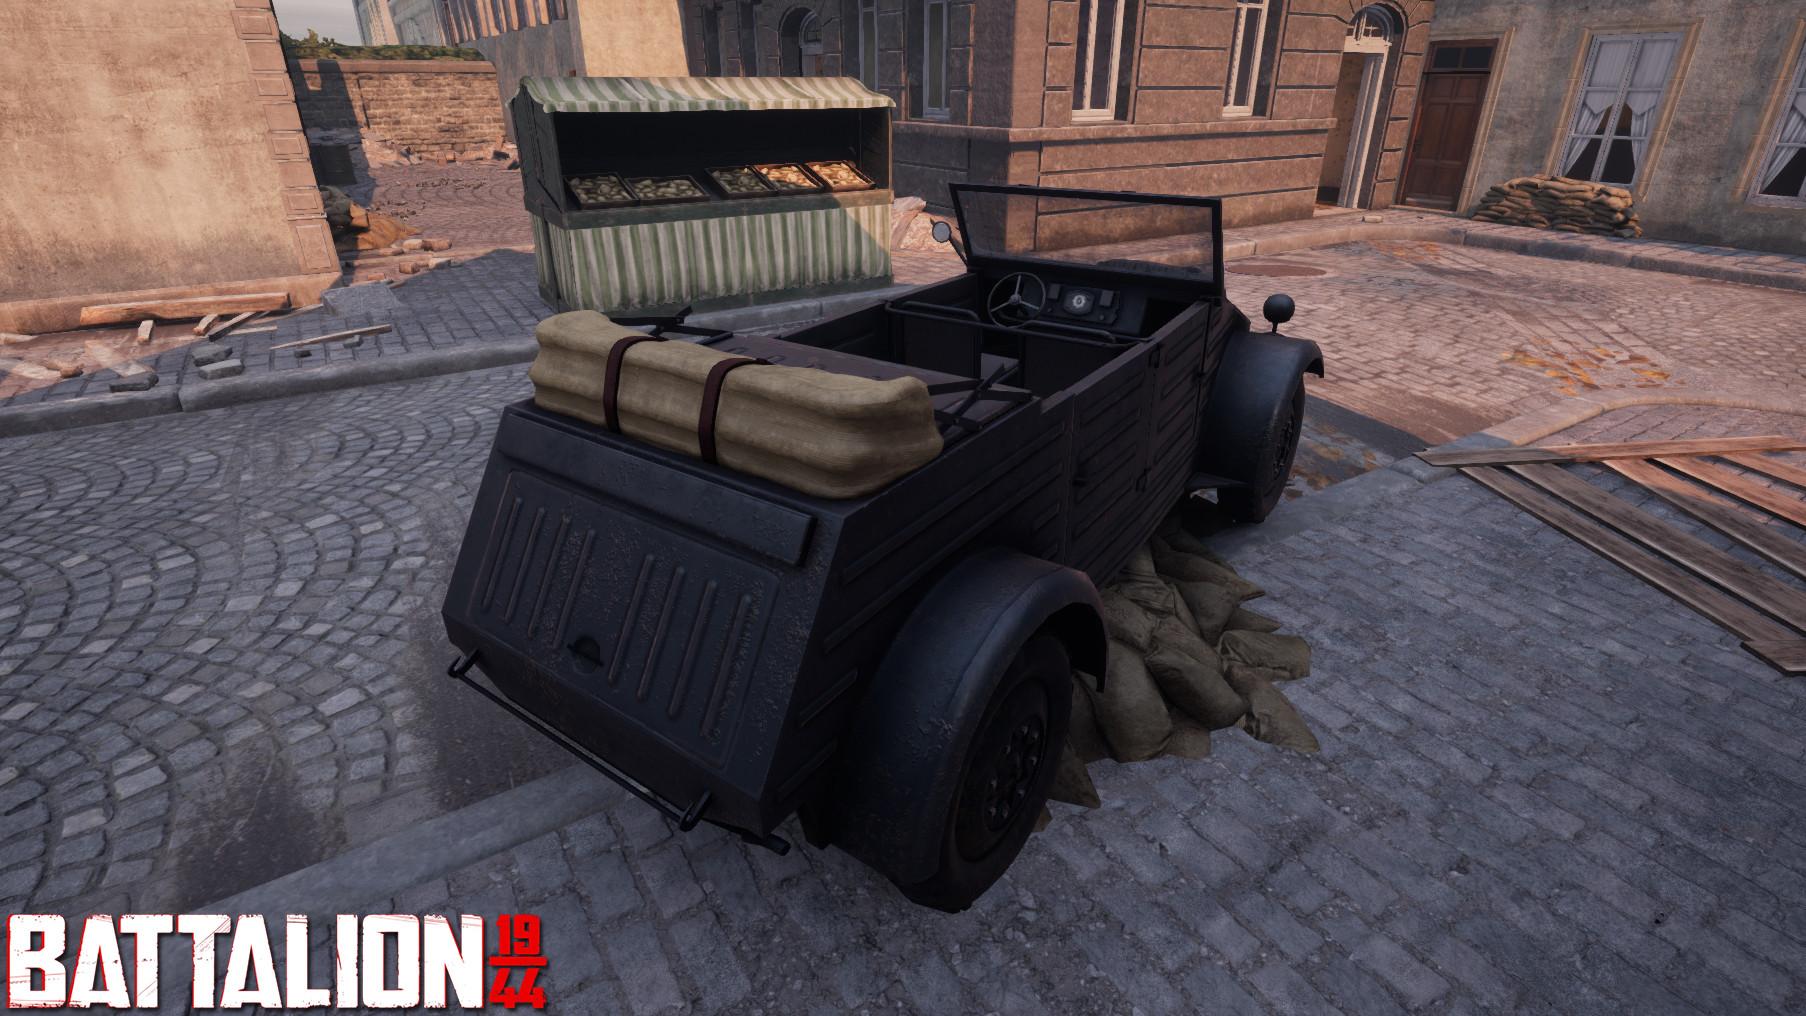 Jordan younie battalion 1944 screenshot 2018 02 25 18 51 00 50